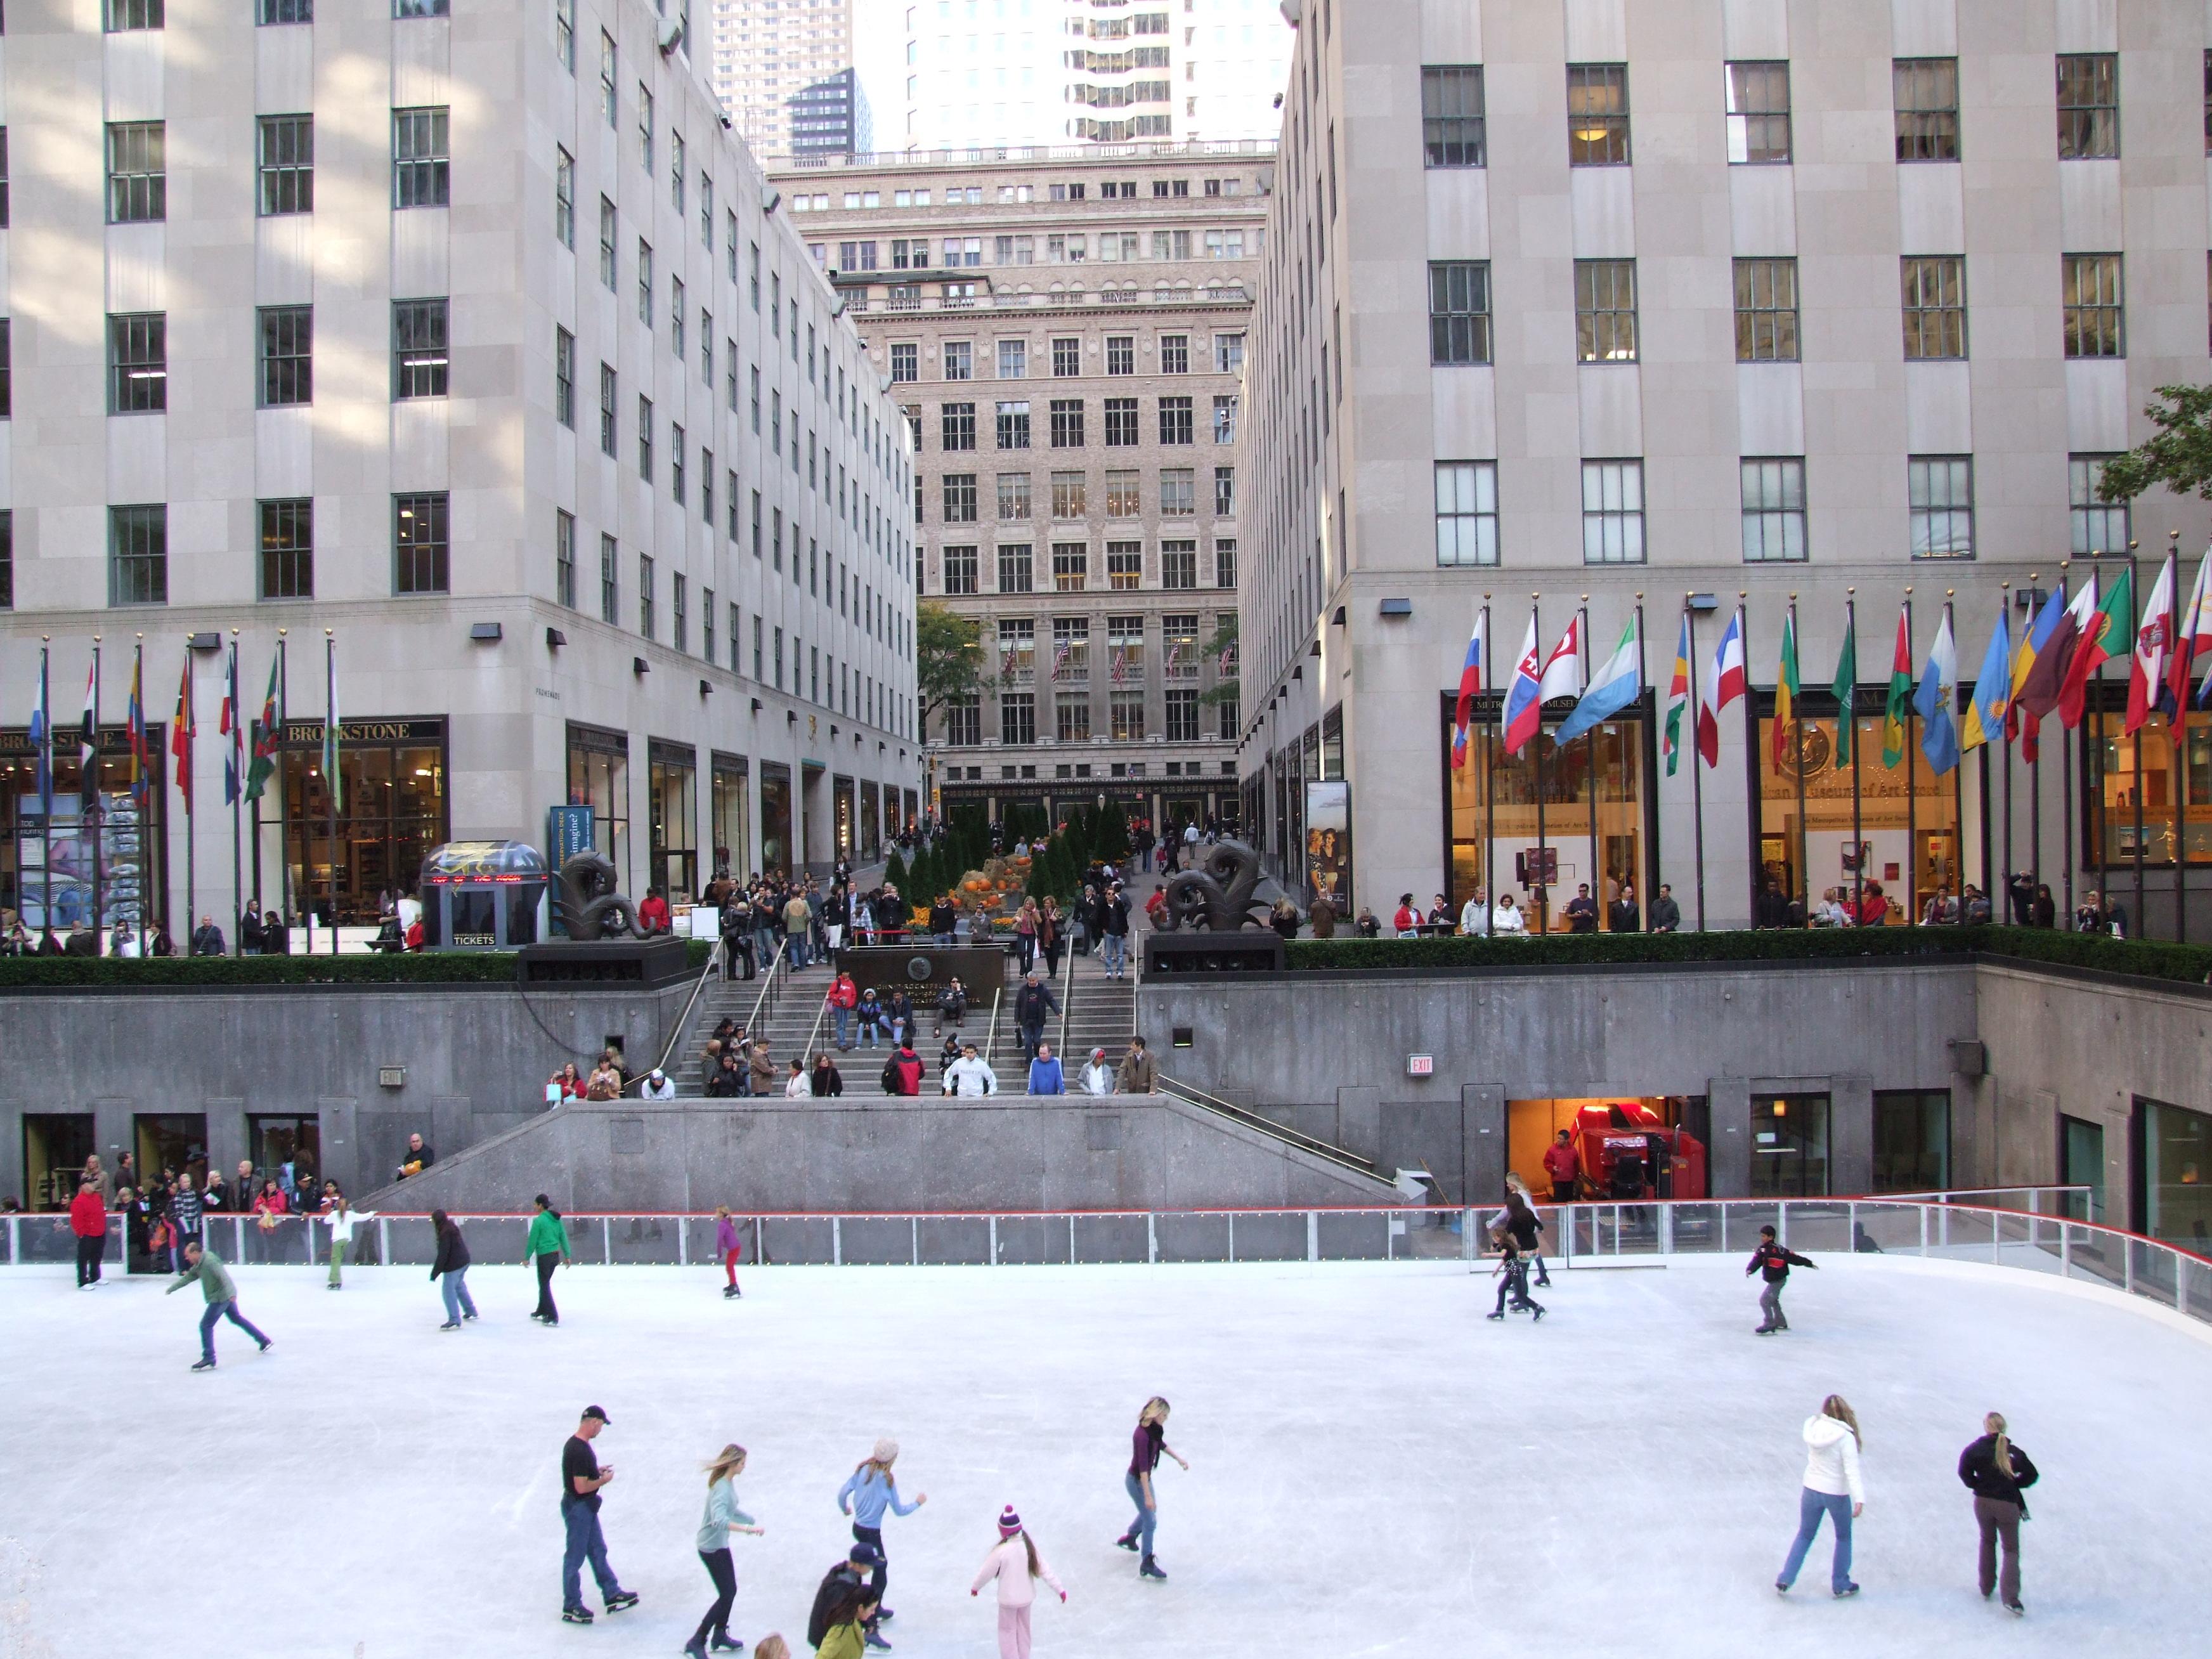 Rockefeller center ice skating rink 2015 best auto reviews